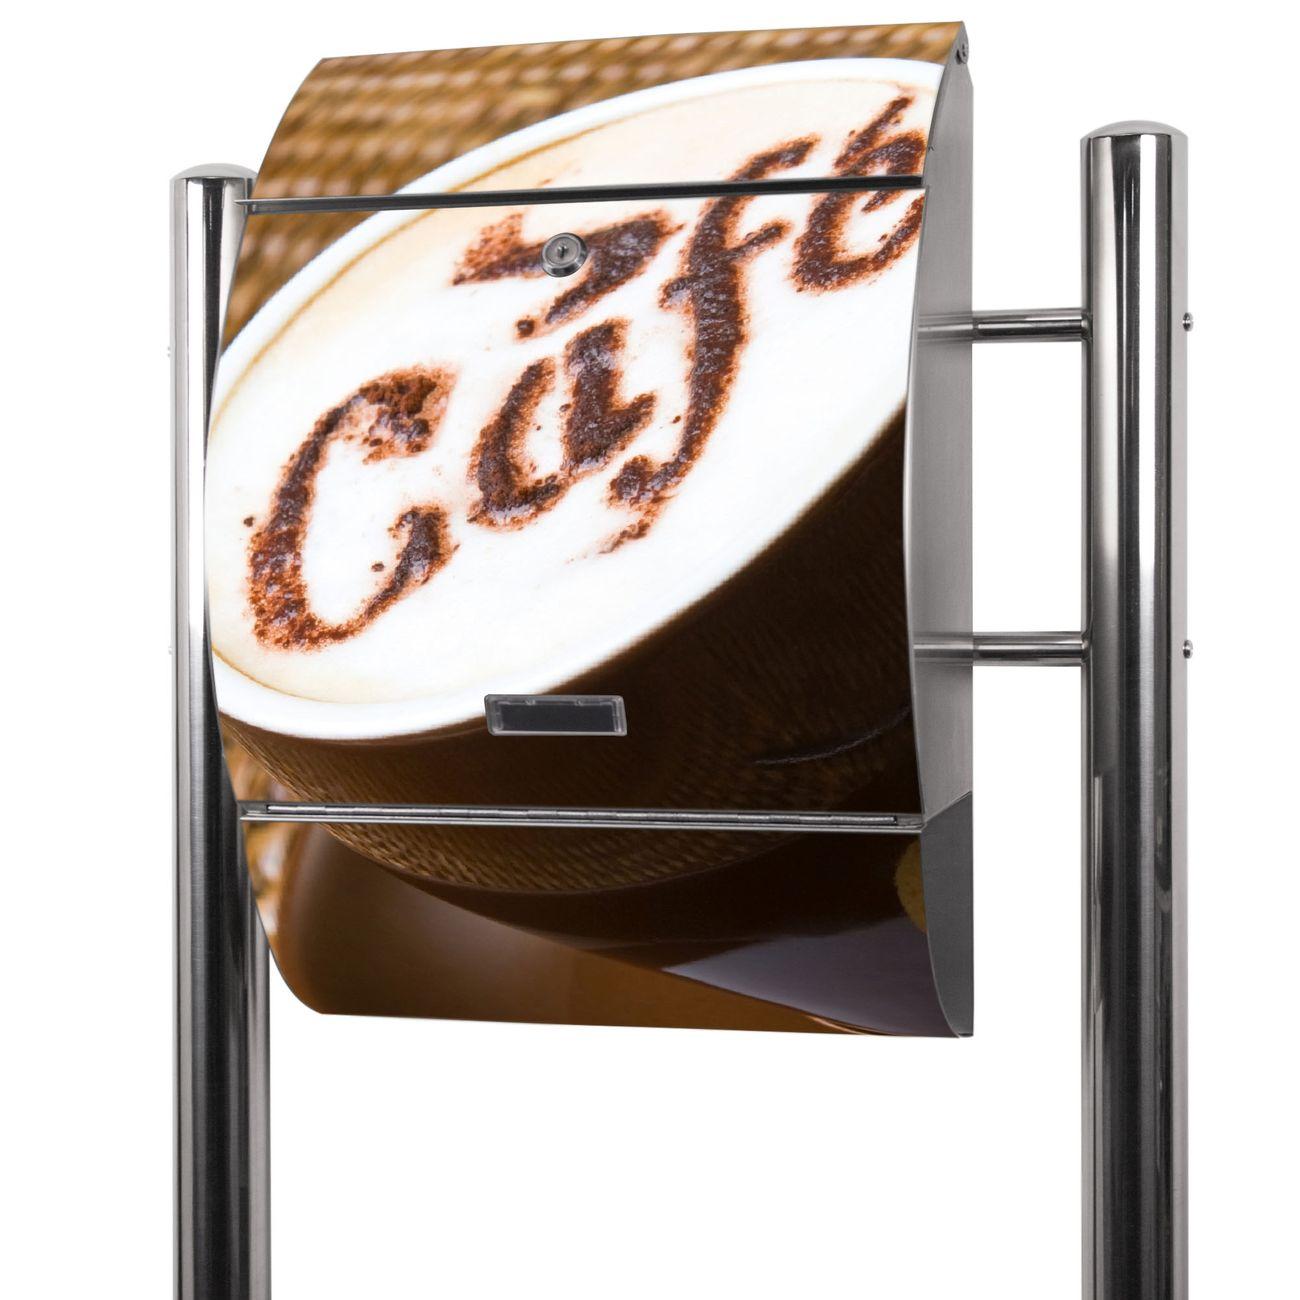 Edelstahl Standbriefkasten Cafe